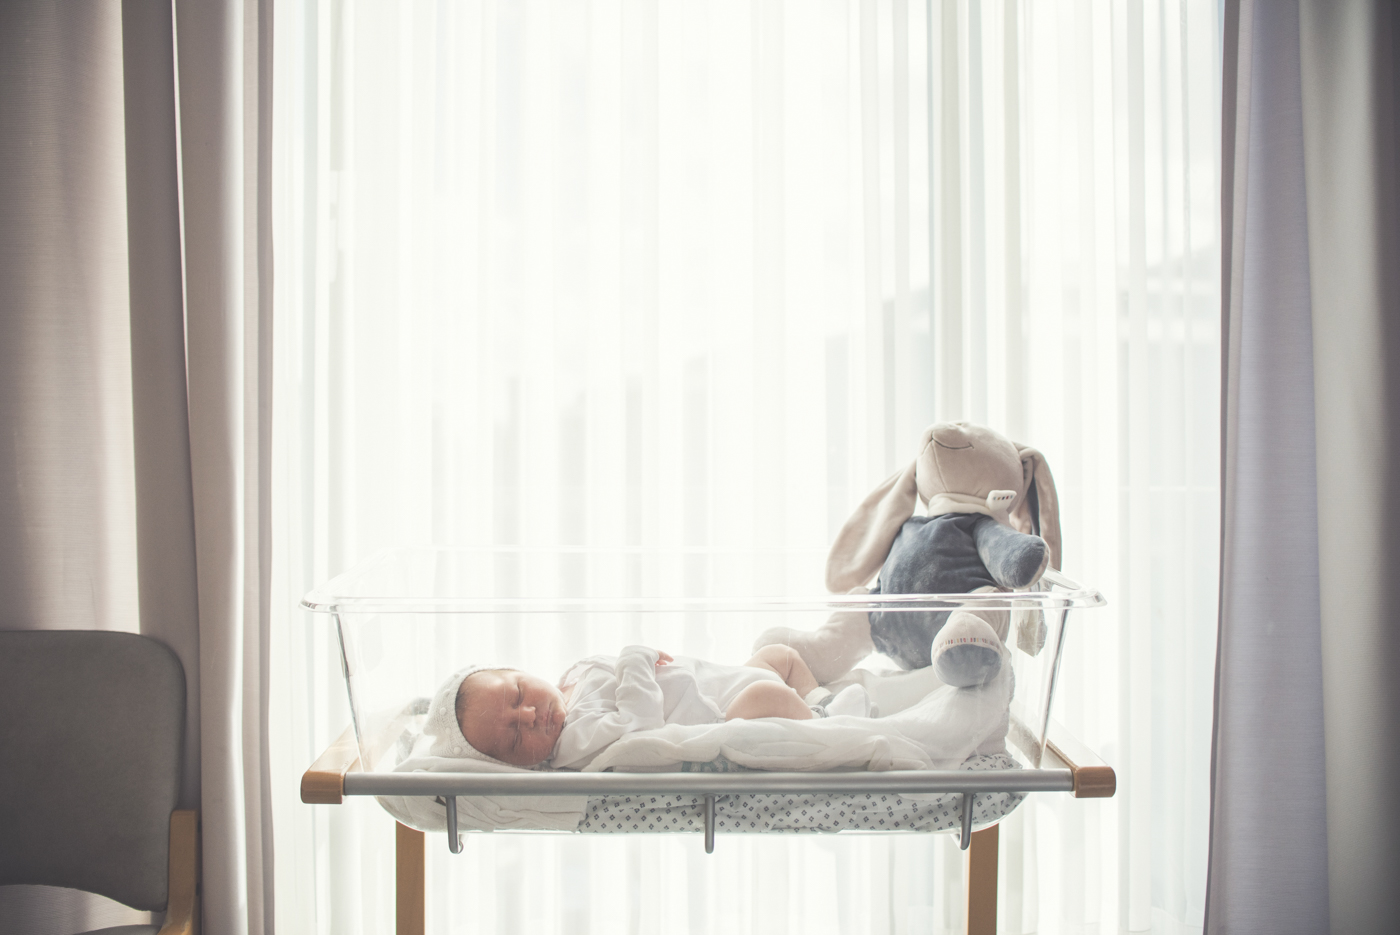 portfolio-fotos-bebes-recien-nacidos-ninos-mia-moments-hospitalbrugman-07.jpg